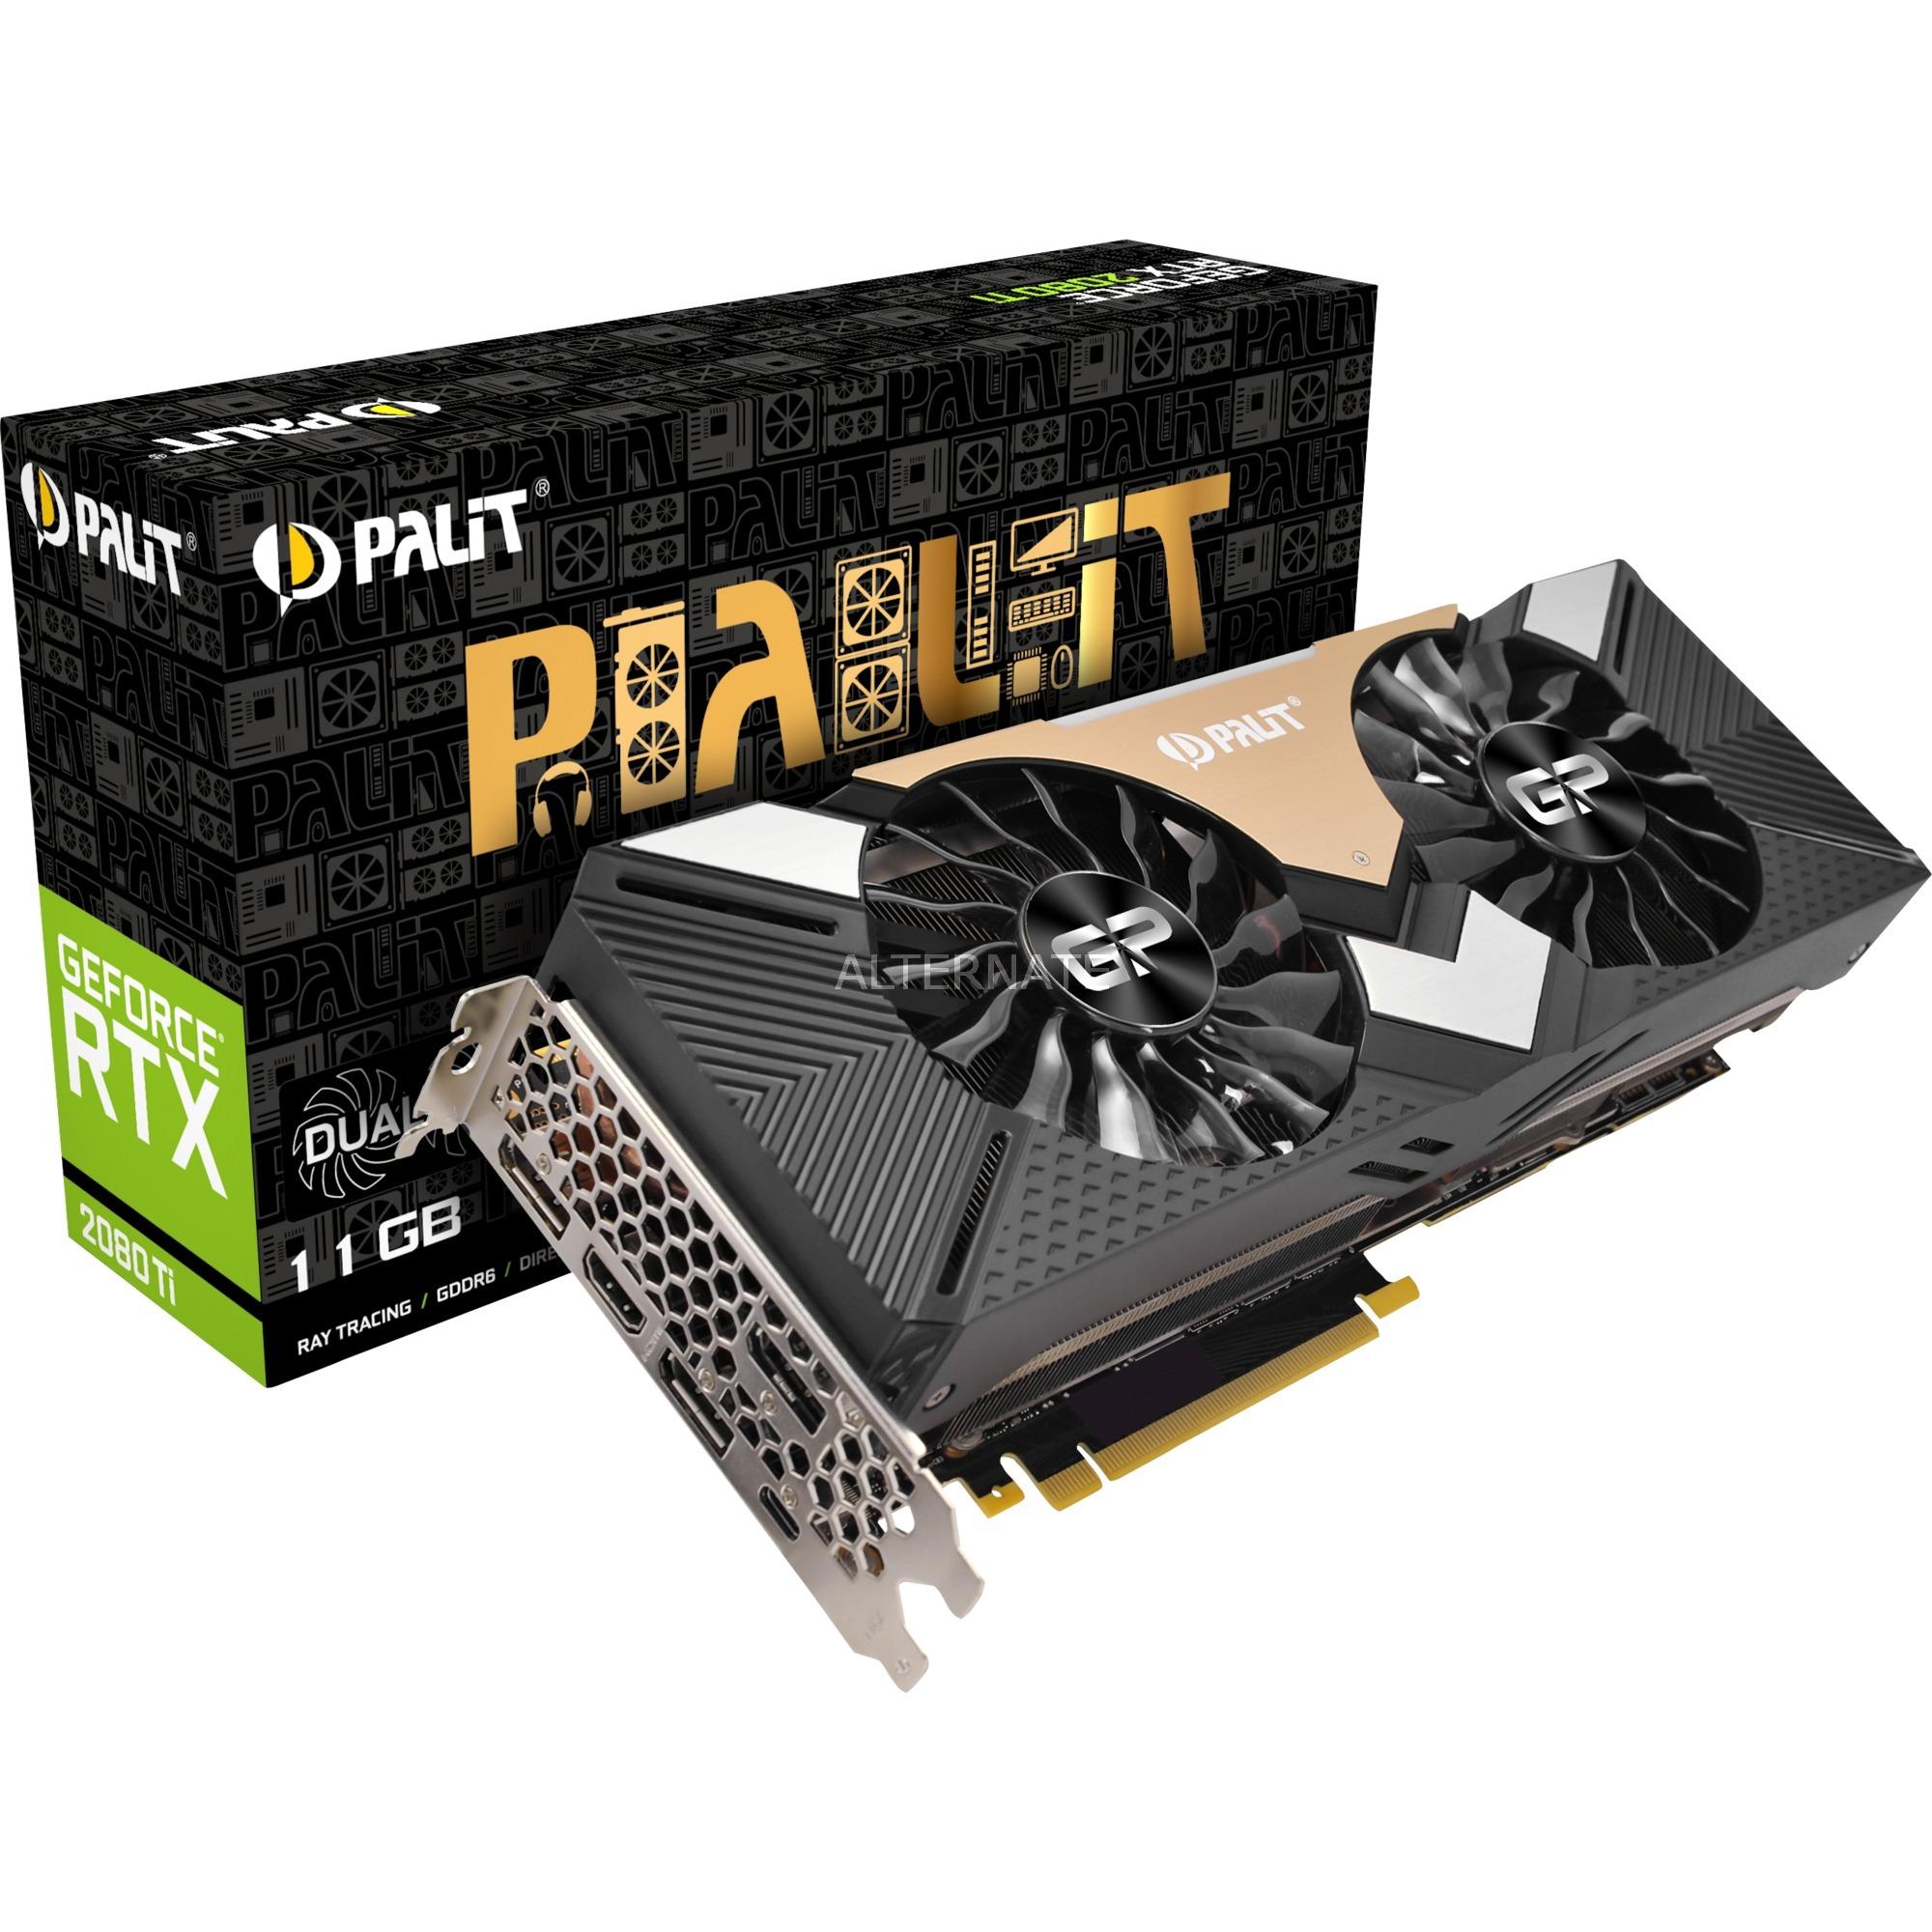 GeForce RTX 2080 Ti DUAL, Tarjeta gráfica